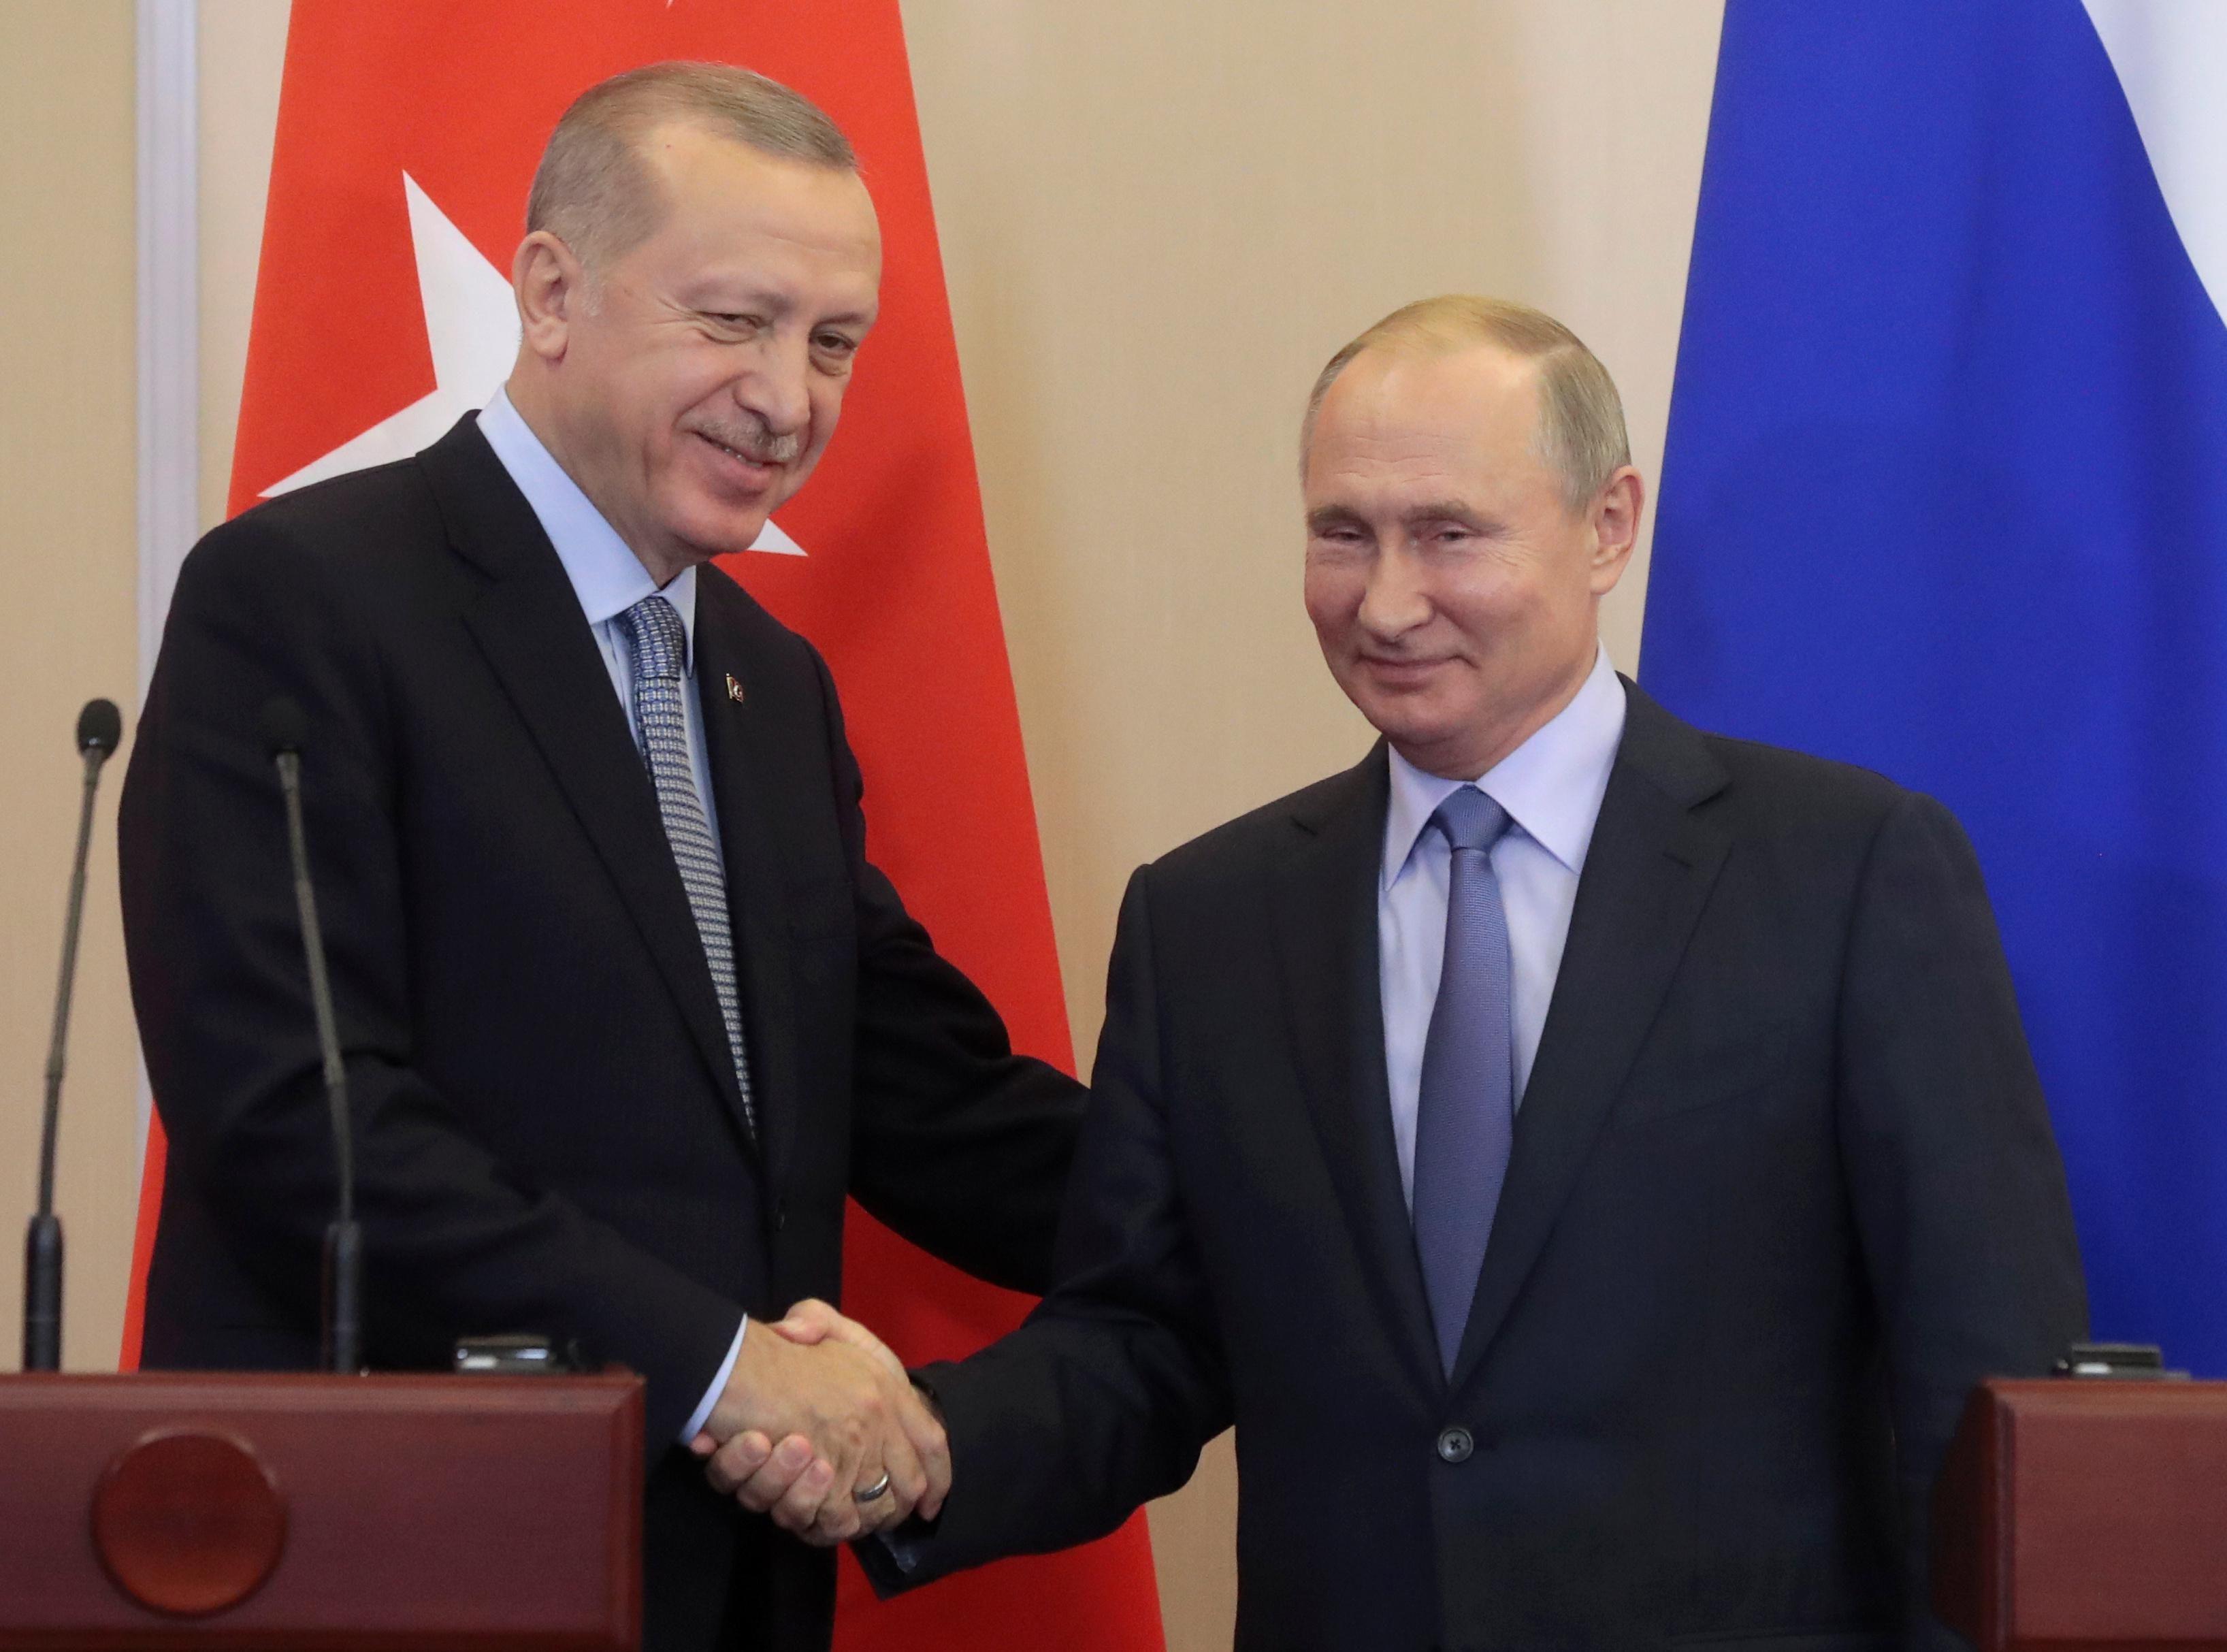 Russian President Vladimir Putin and Turkish President Recep Tayyip Erdogan shake hands during their joint news conference following Russian-Turkish talks in the Black sea resort of Sochi. Reuters